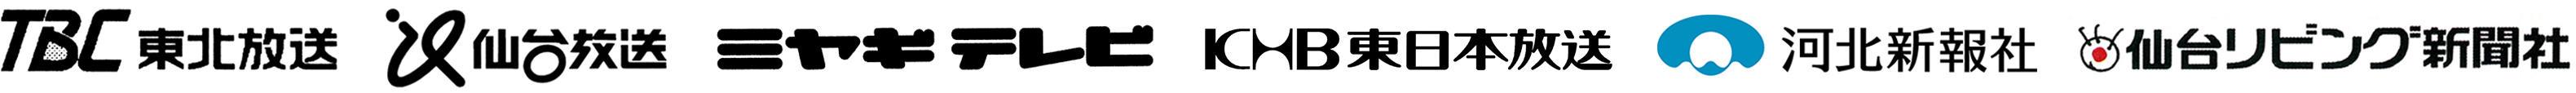 TBC〜仙台リビング修正.jpg